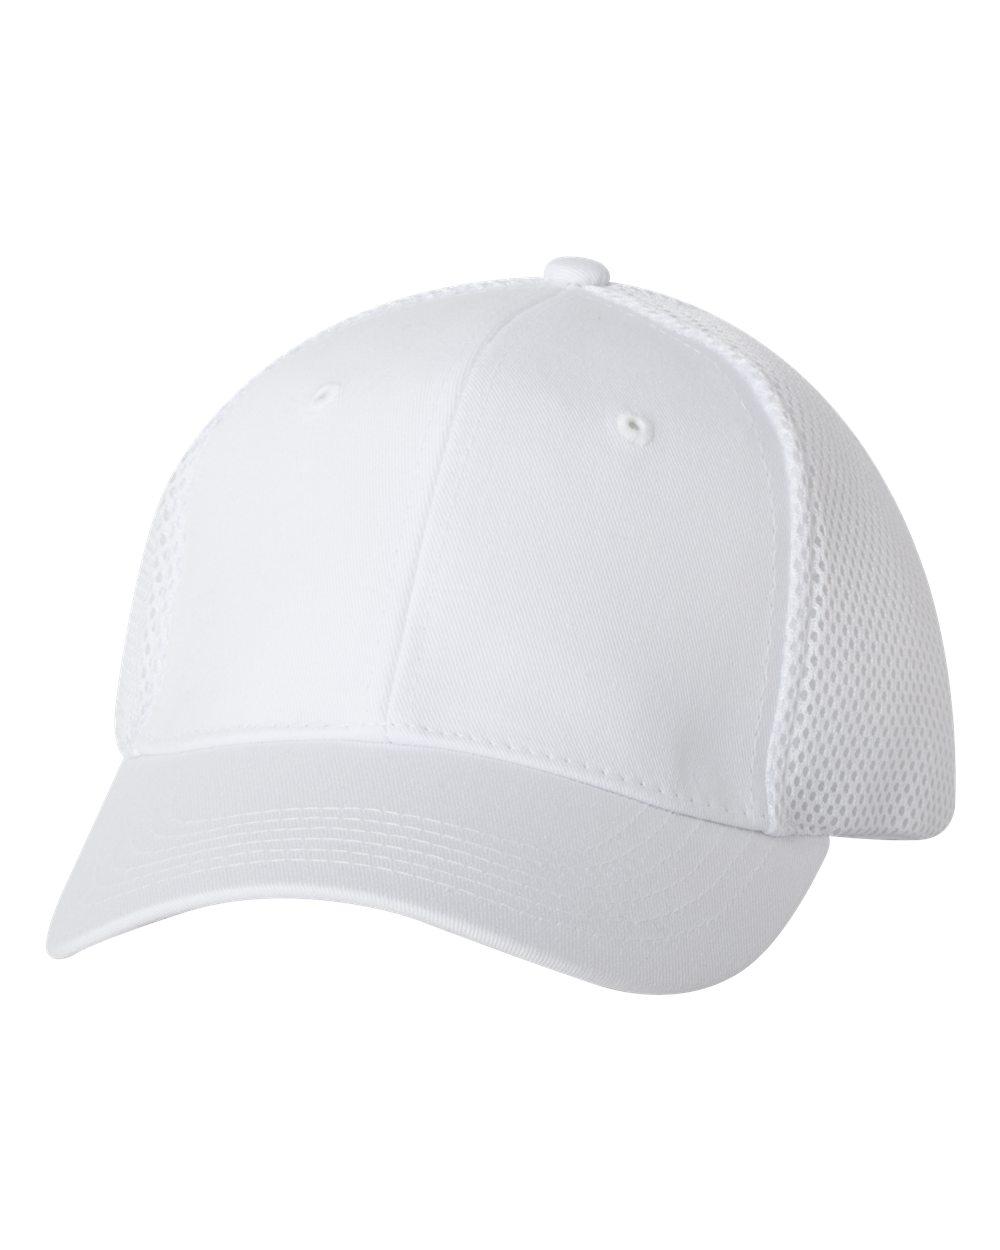 e2158e4b Opentip.com: Sportsman 3200 Spacer Mesh Cap, Price/each